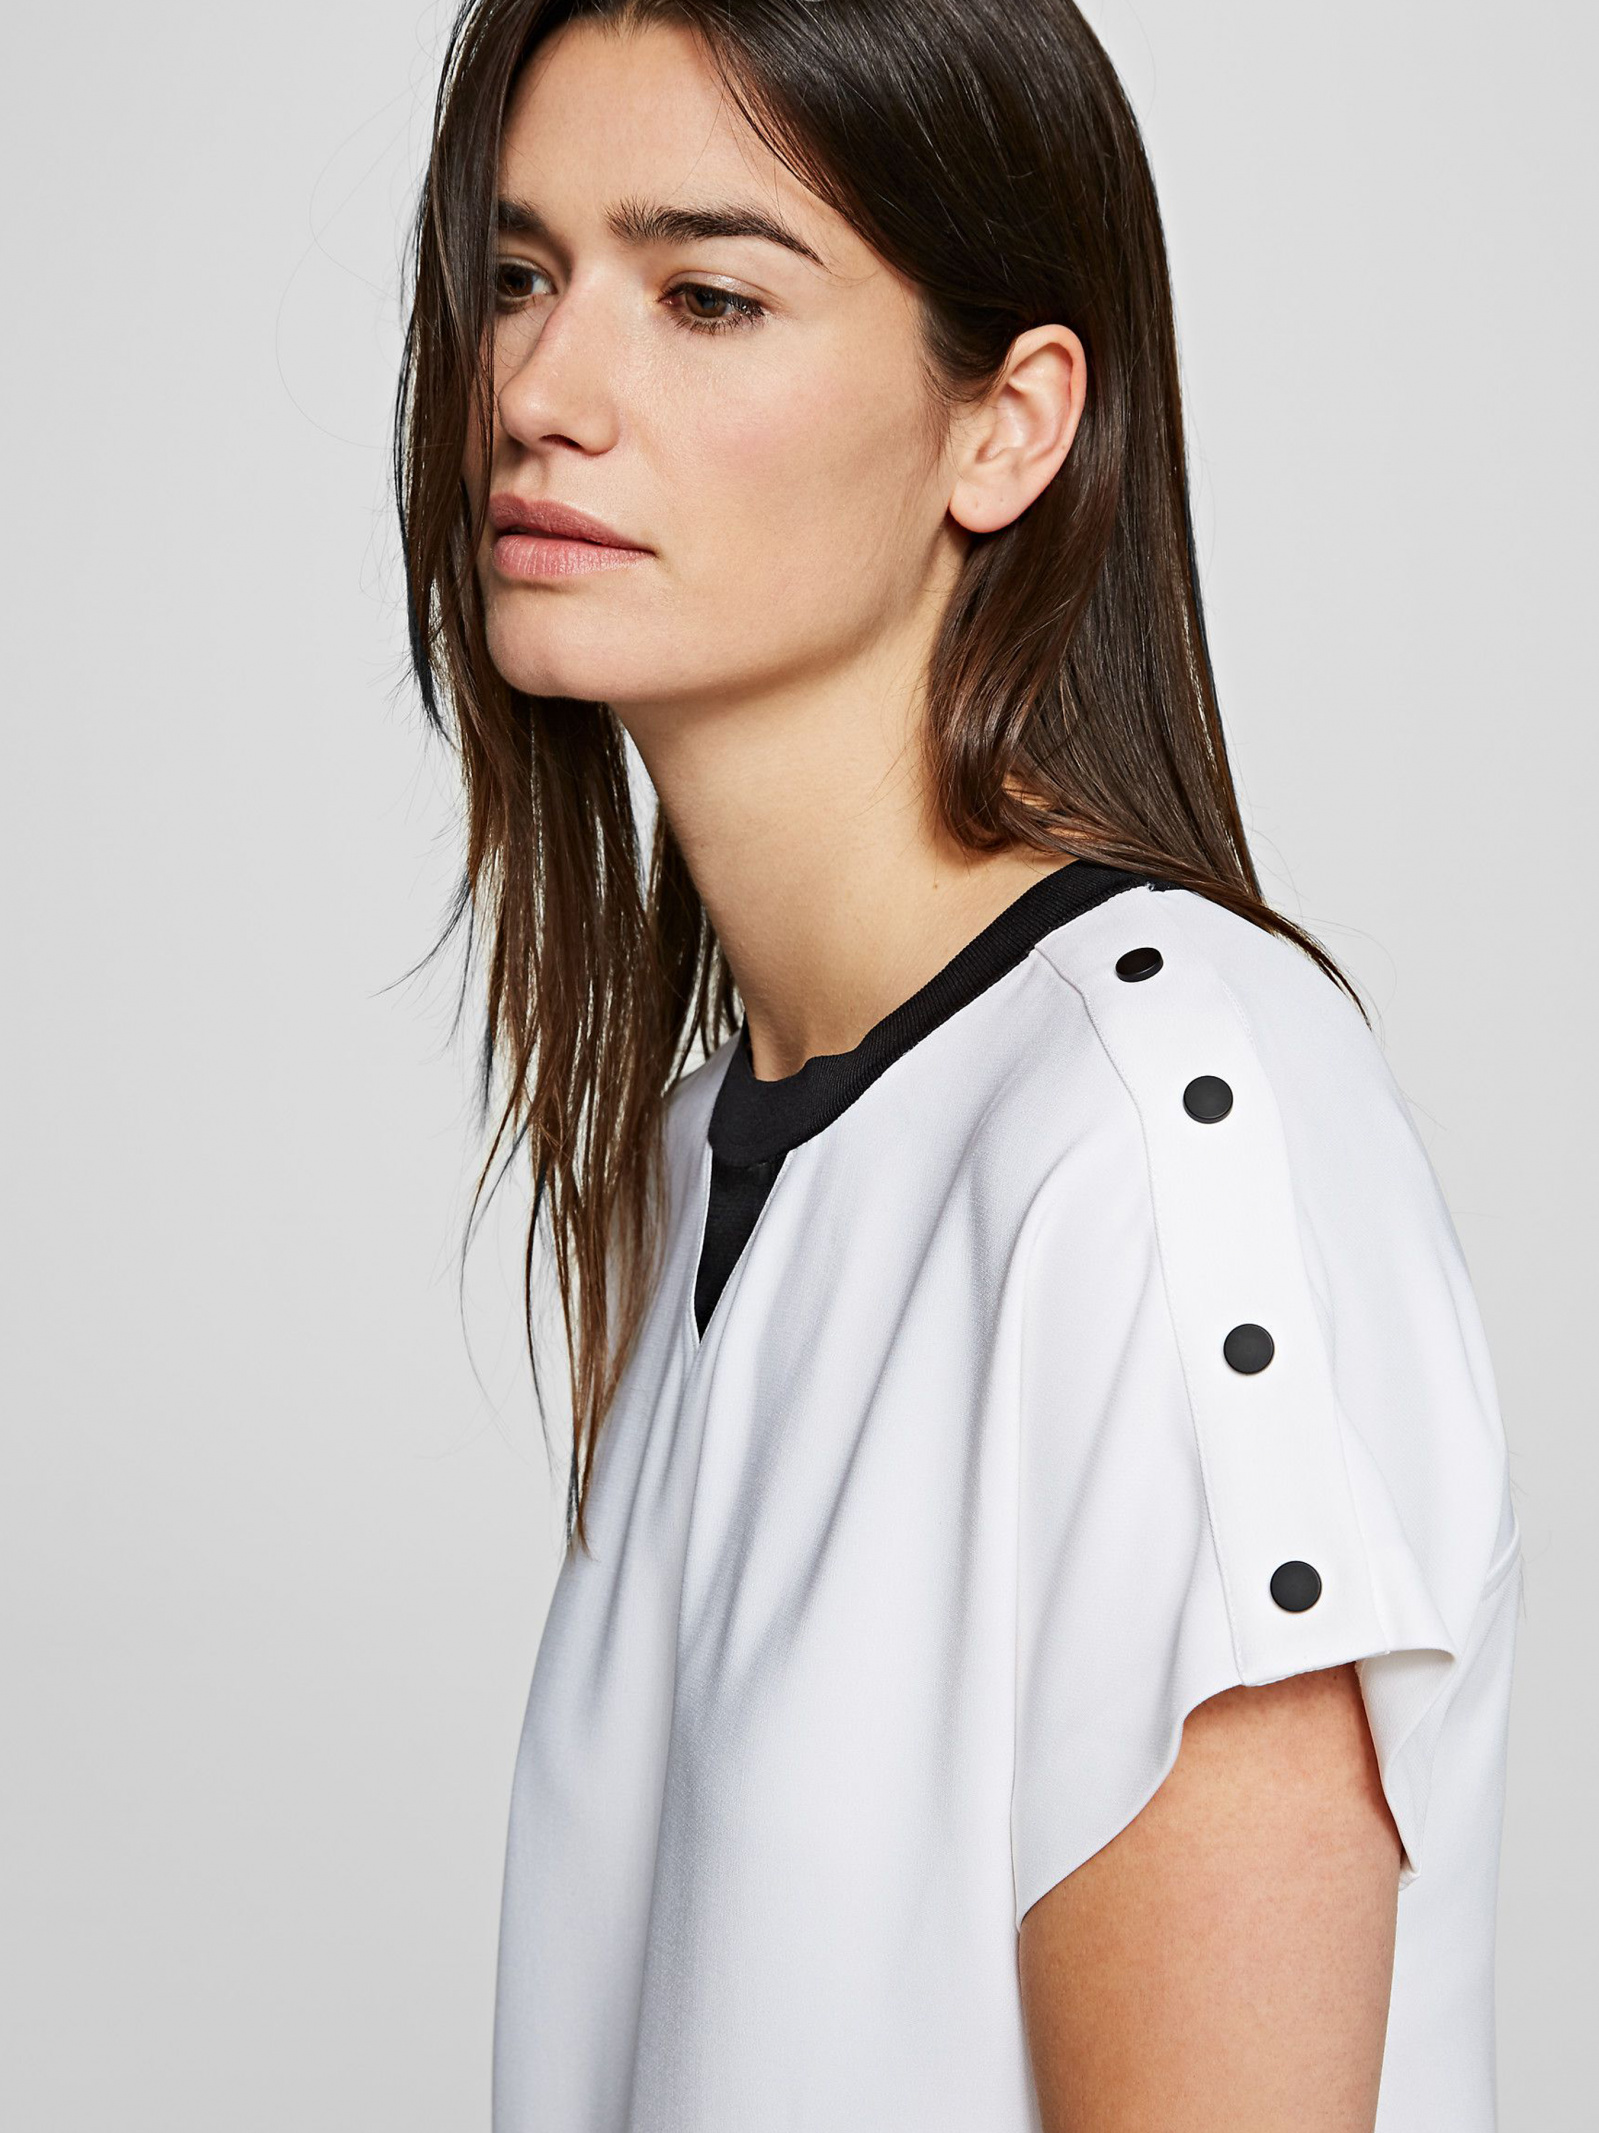 Платье женские Karl Lagerfeld модель 201W1300_100_0041 цена, 2017